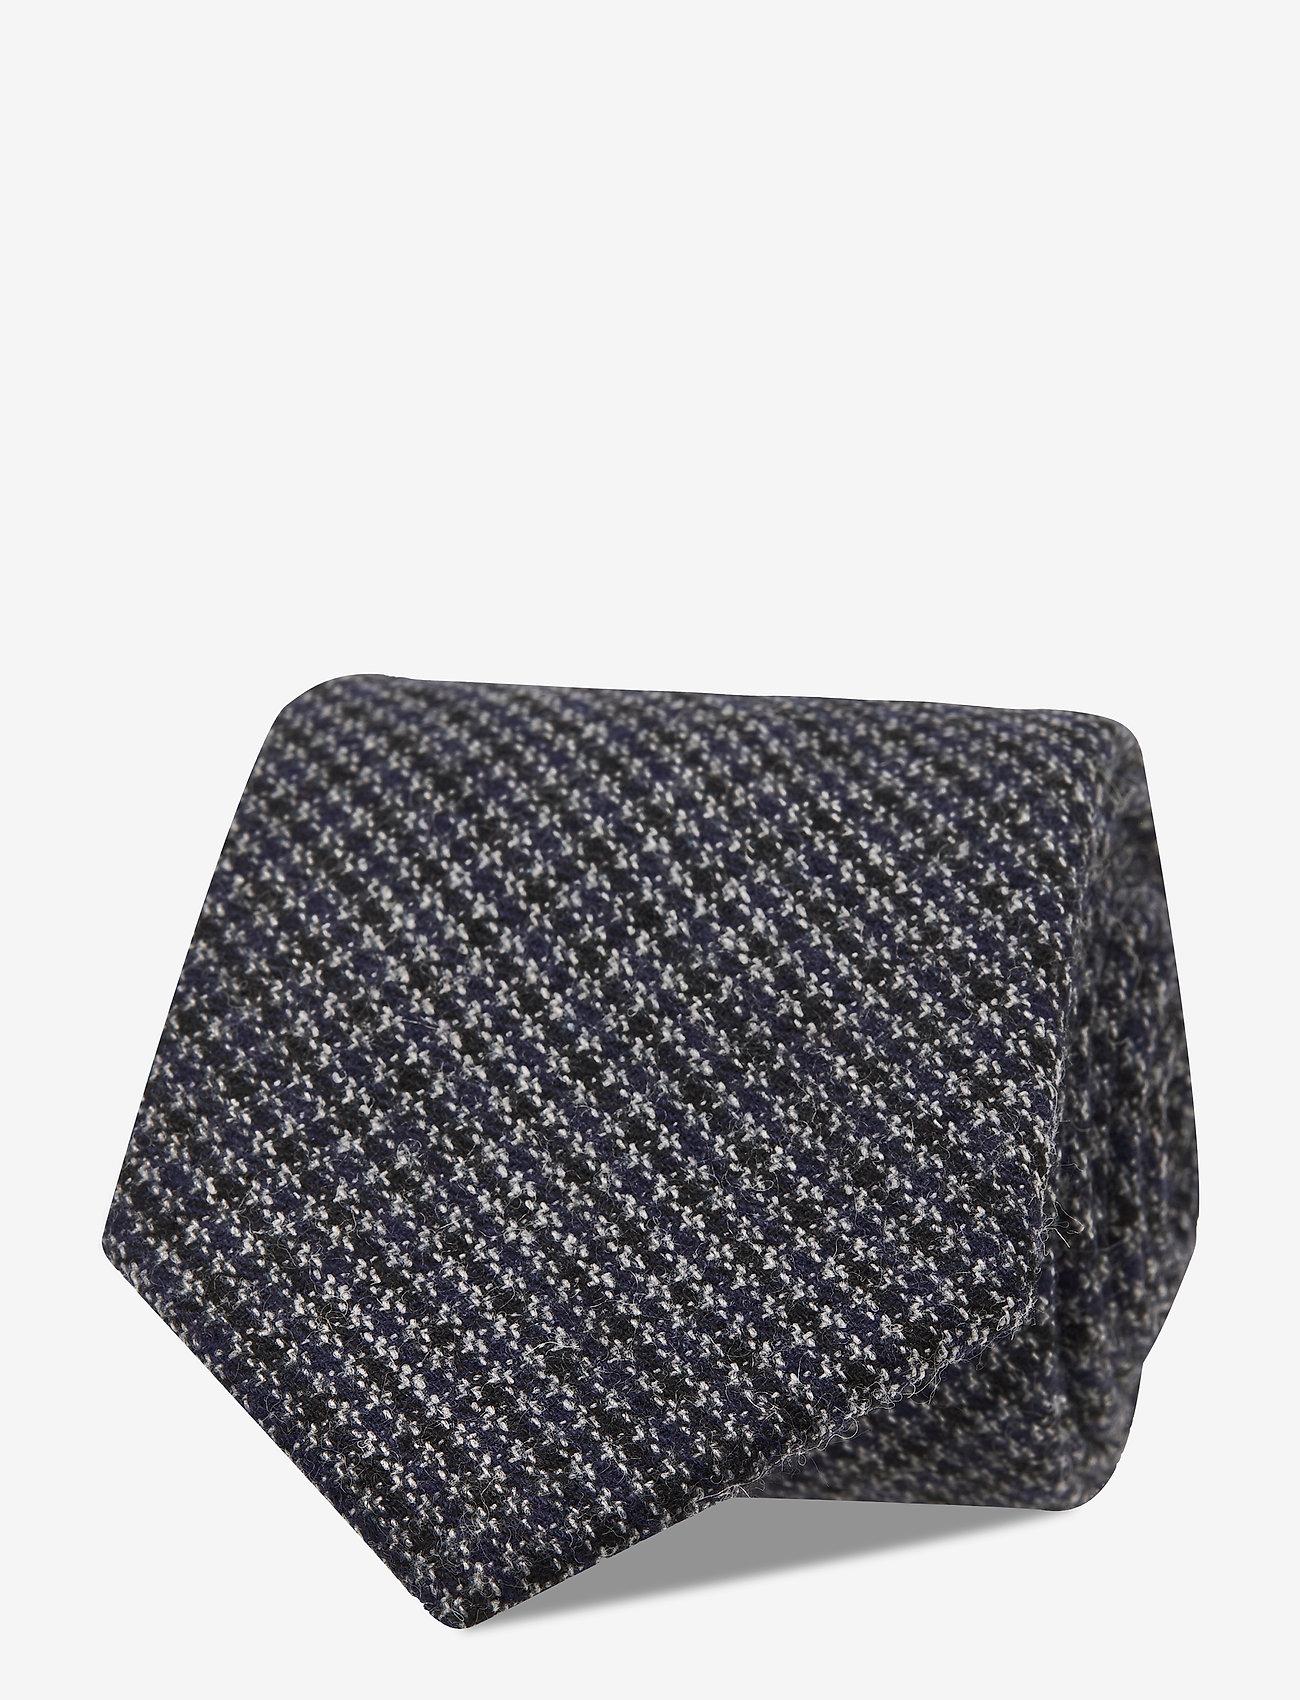 An Ivy - Black Blue Houndstooth Wool Tie - cravates - grey - 1